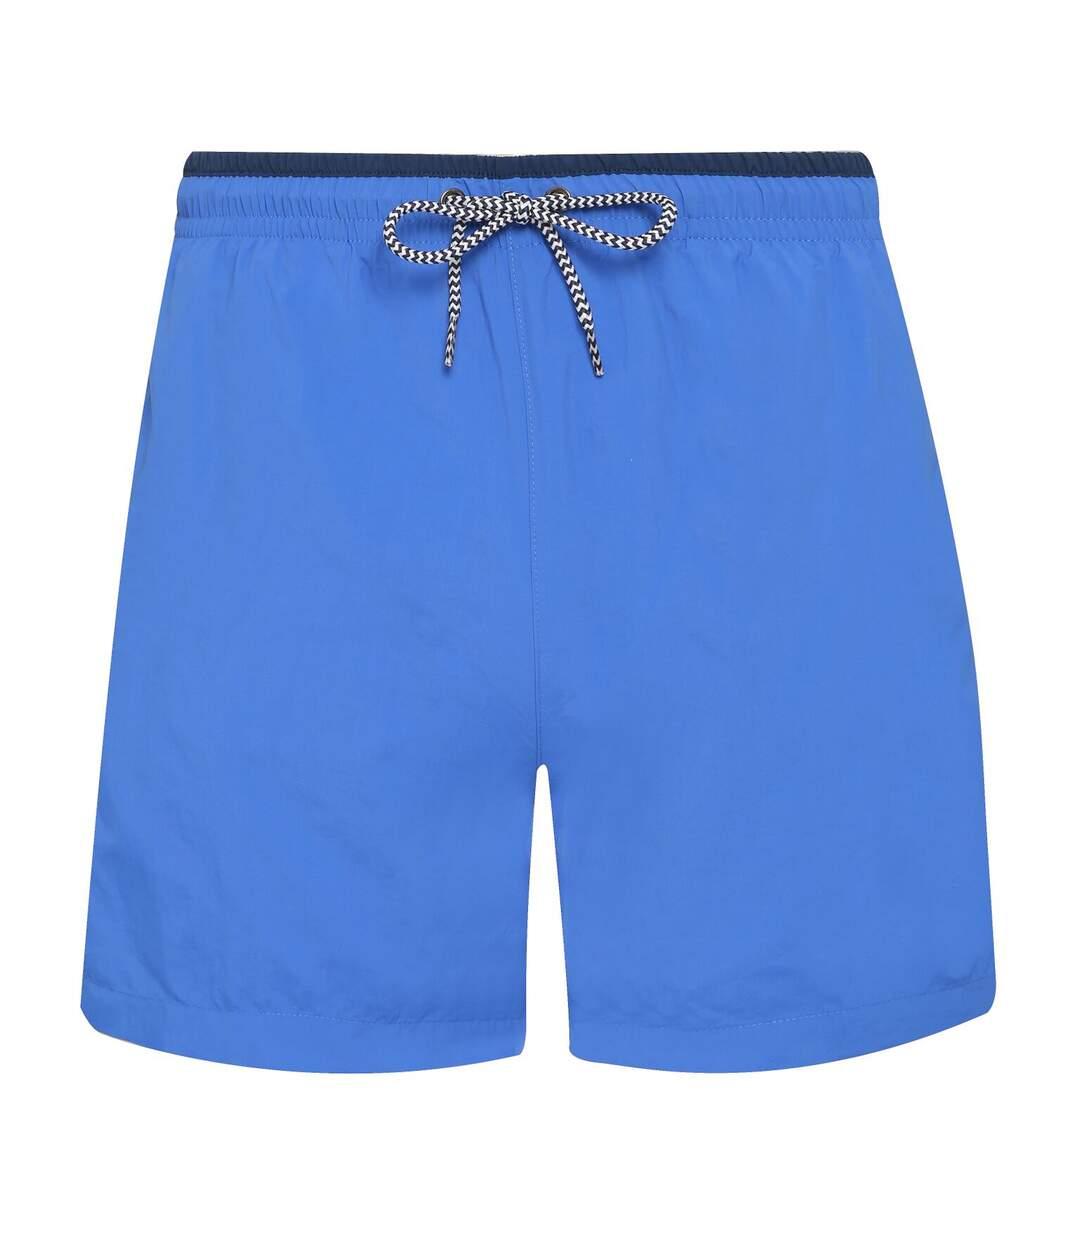 Asquith & Fox Mens Swim Shorts (Royal/Navy) - UTRW6242